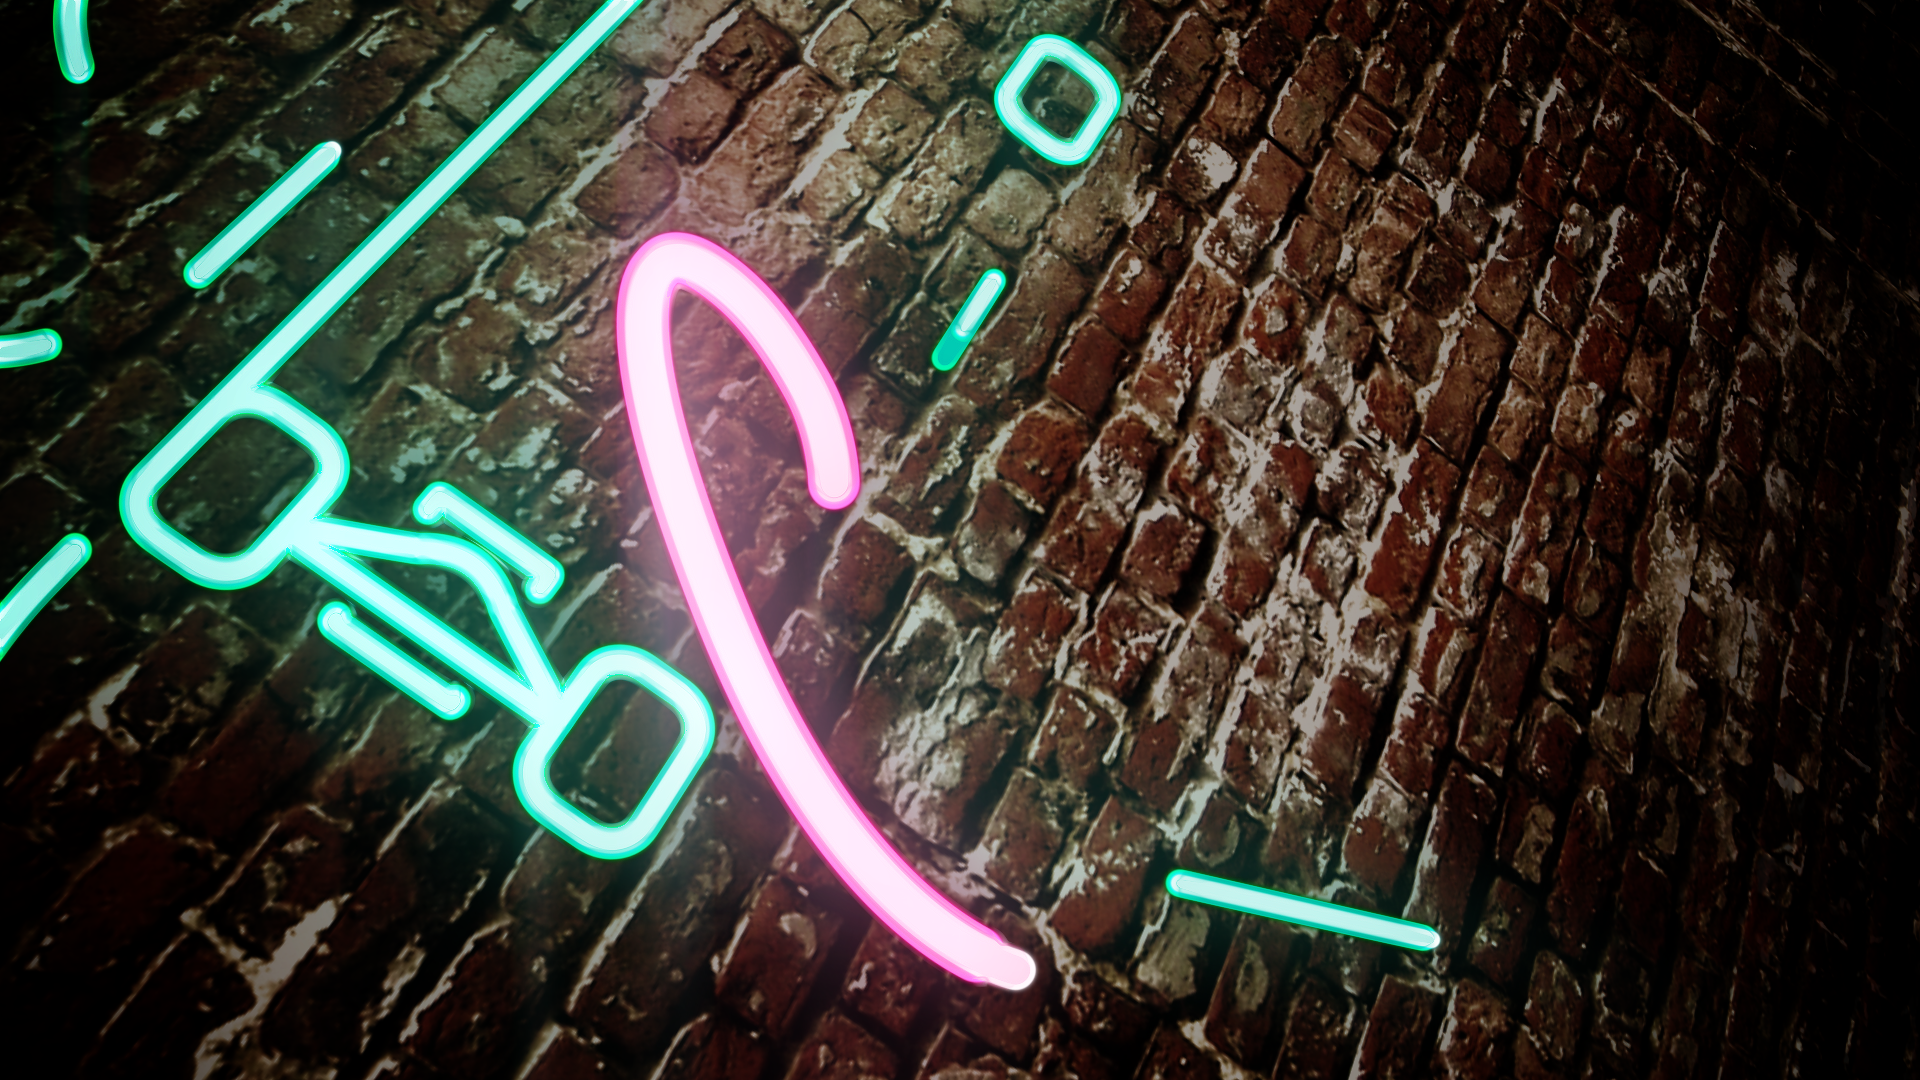 2015-05-Skate-Cafe-Skate-Cafe-logo-writes-on-wall-FINAL-00070